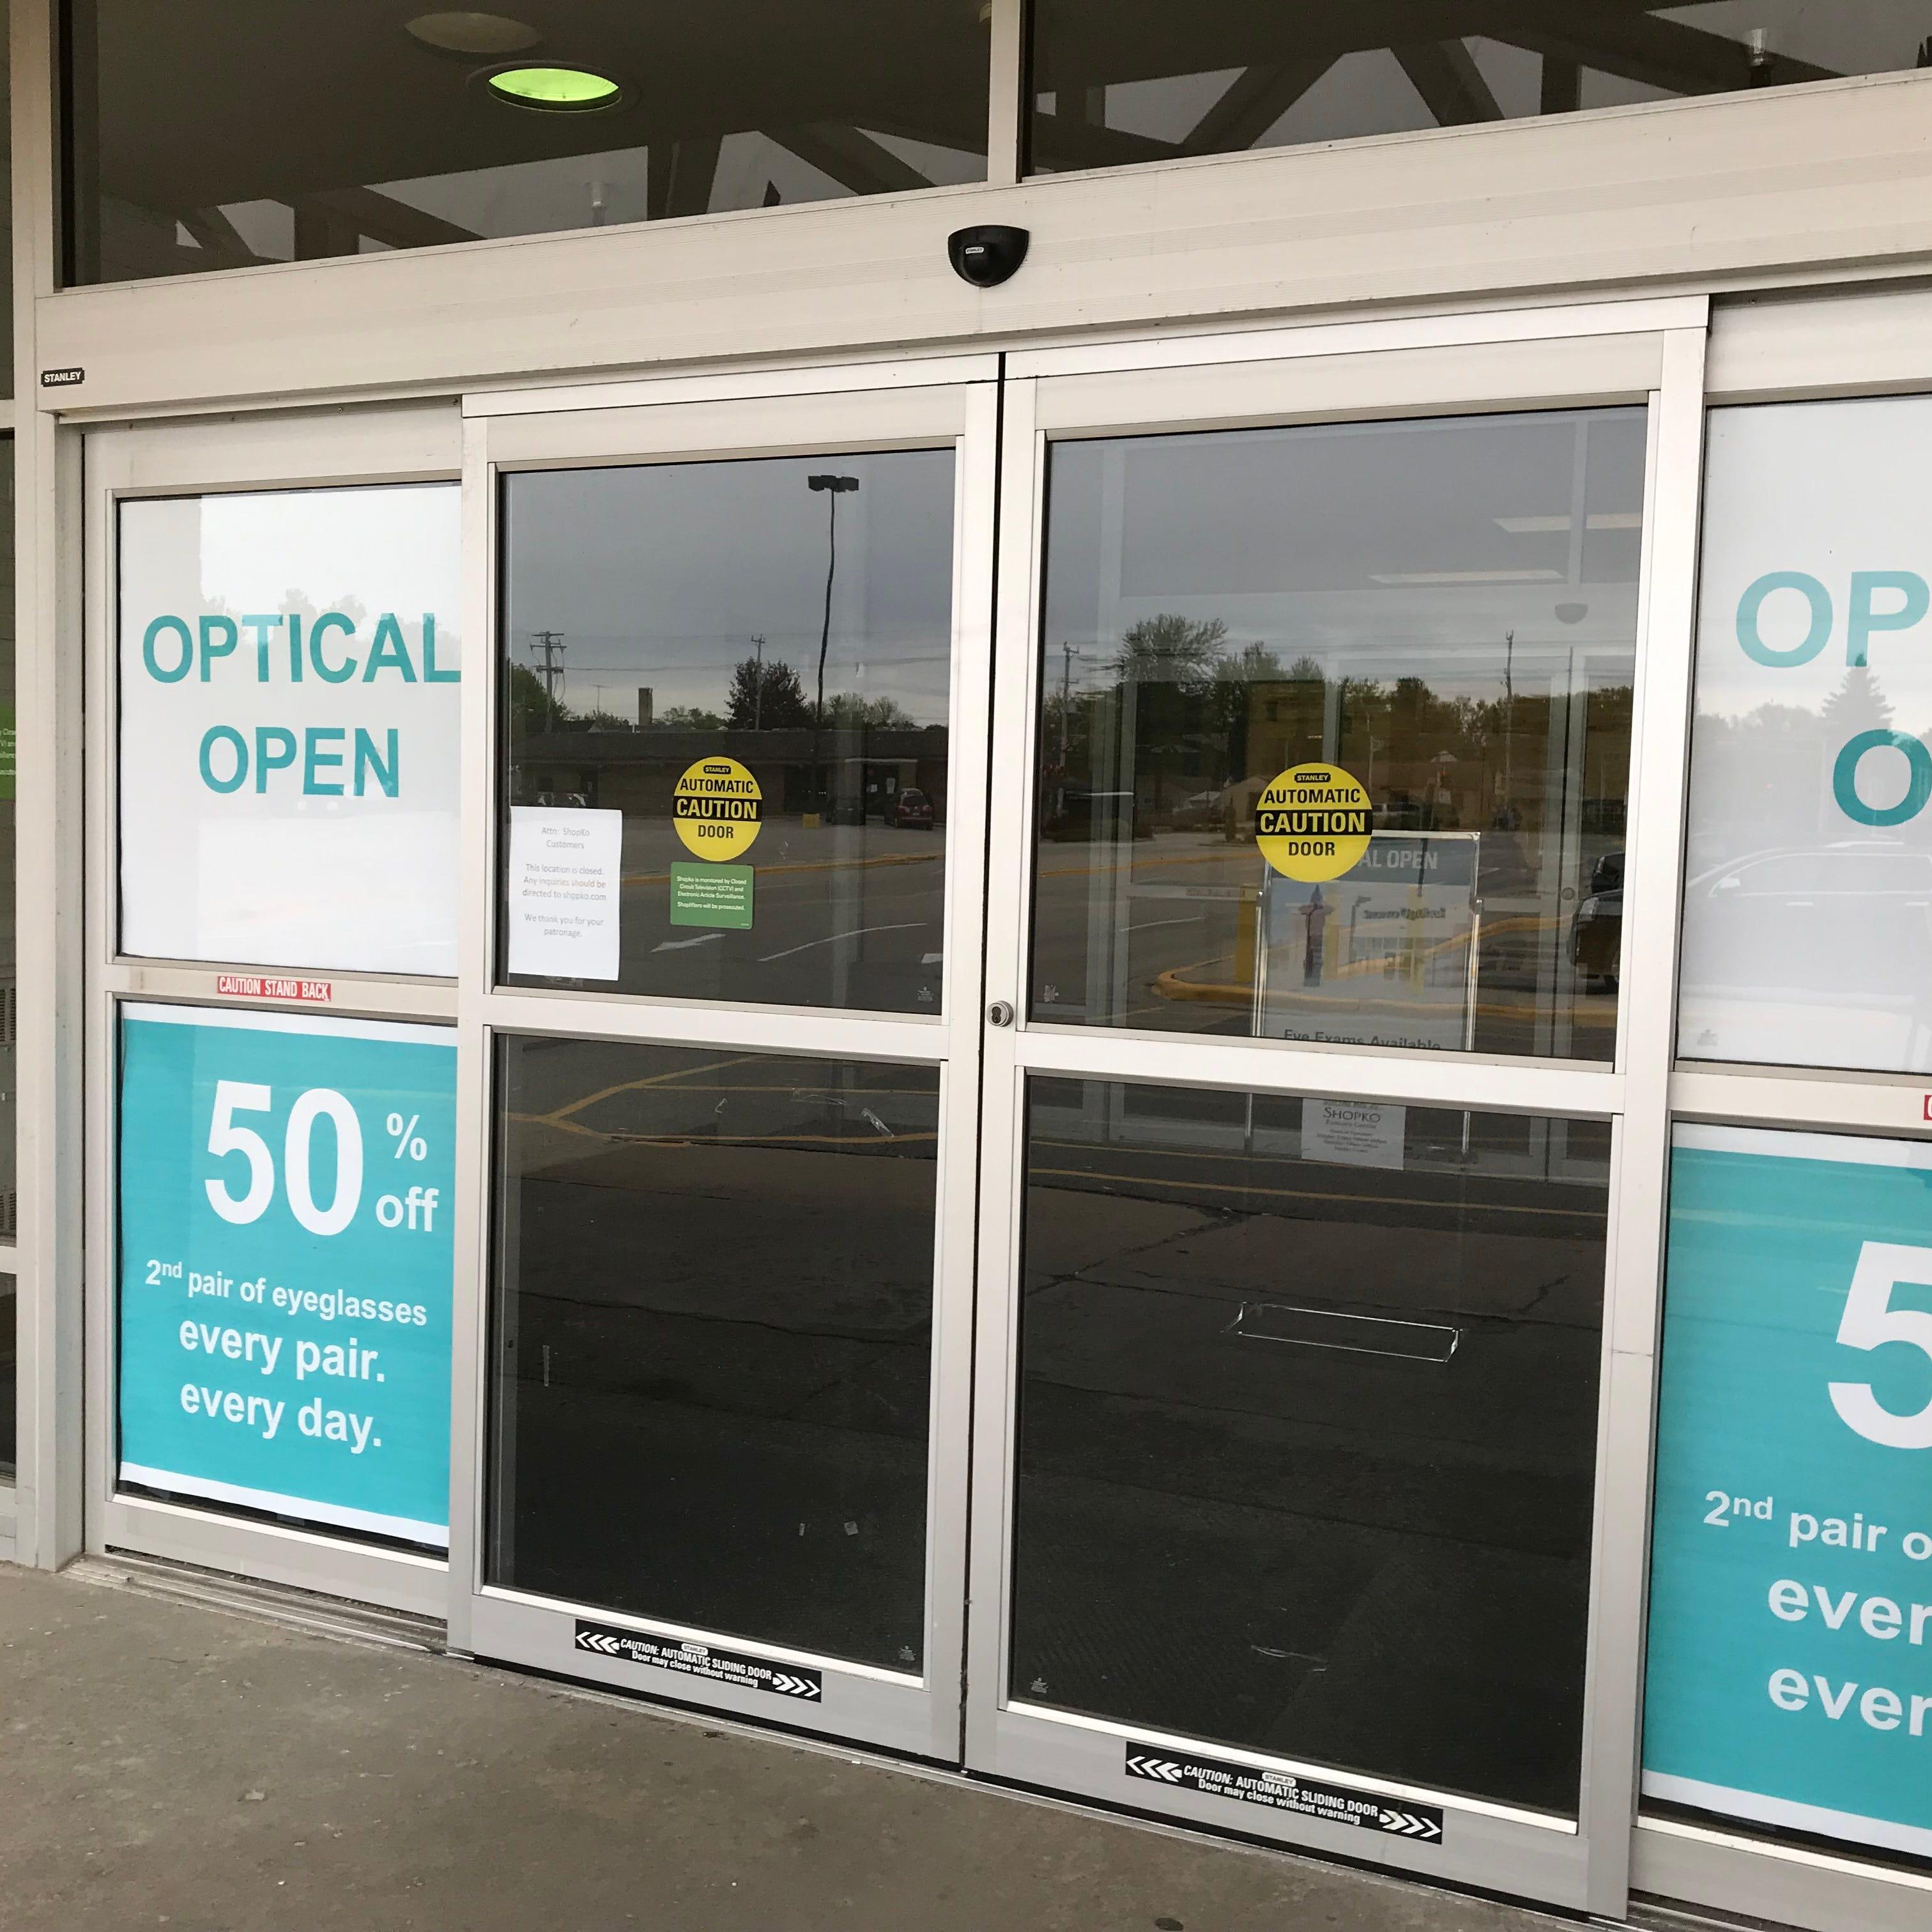 The Buzz: Shopko Optical shops make plans